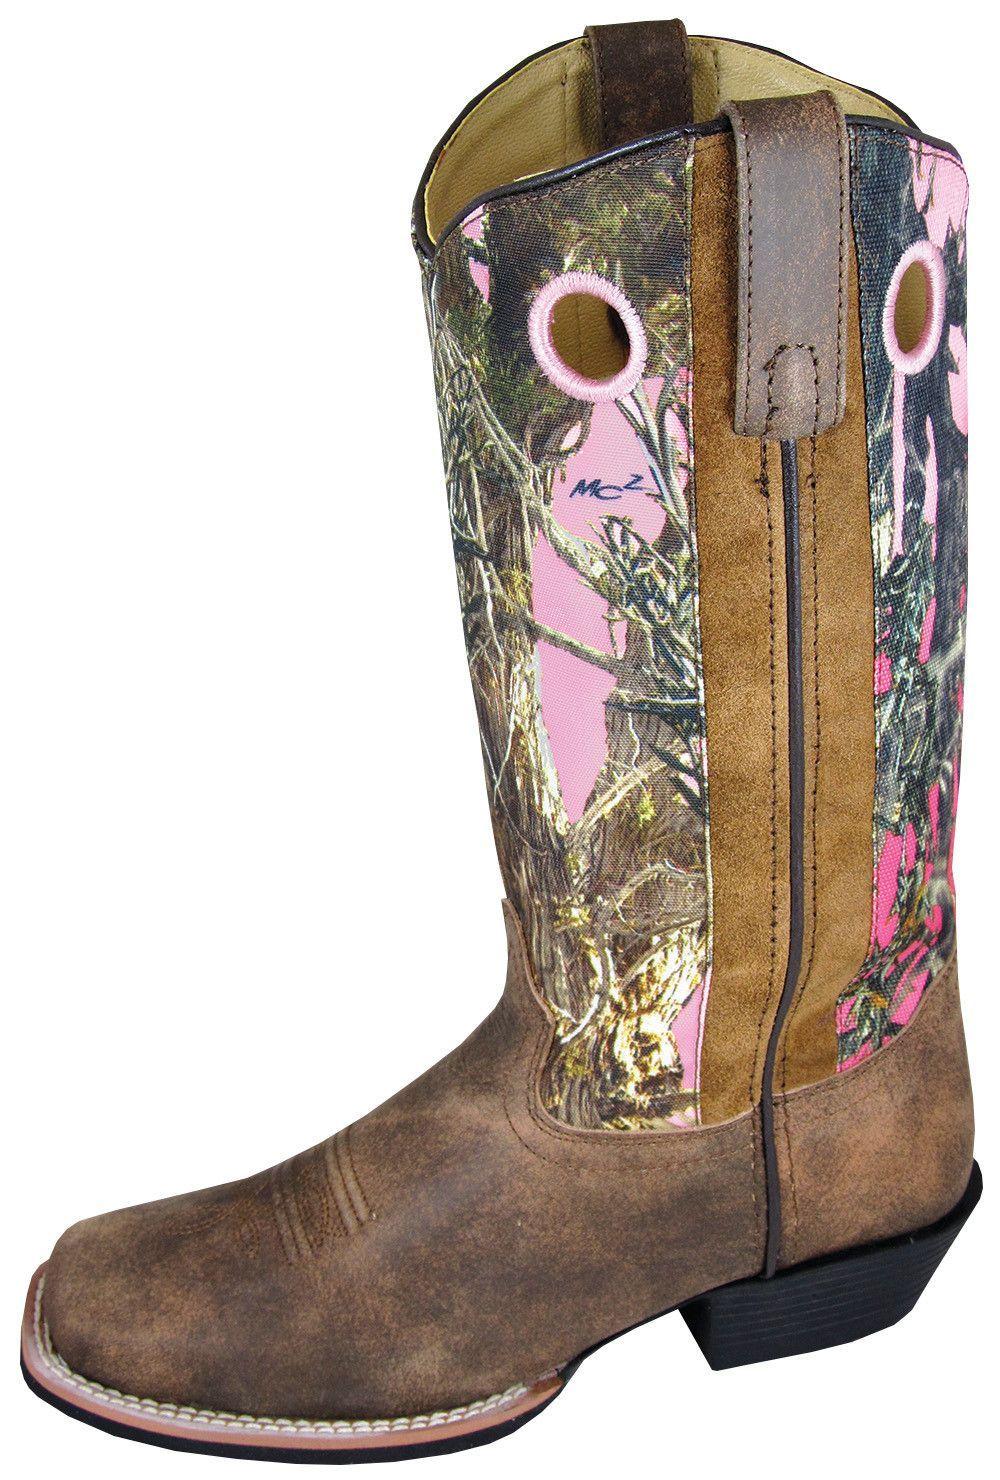 84708979a4e Smoky Mountain Boots Womens Tupelo Brown/Pink Distress Leather Camo ...